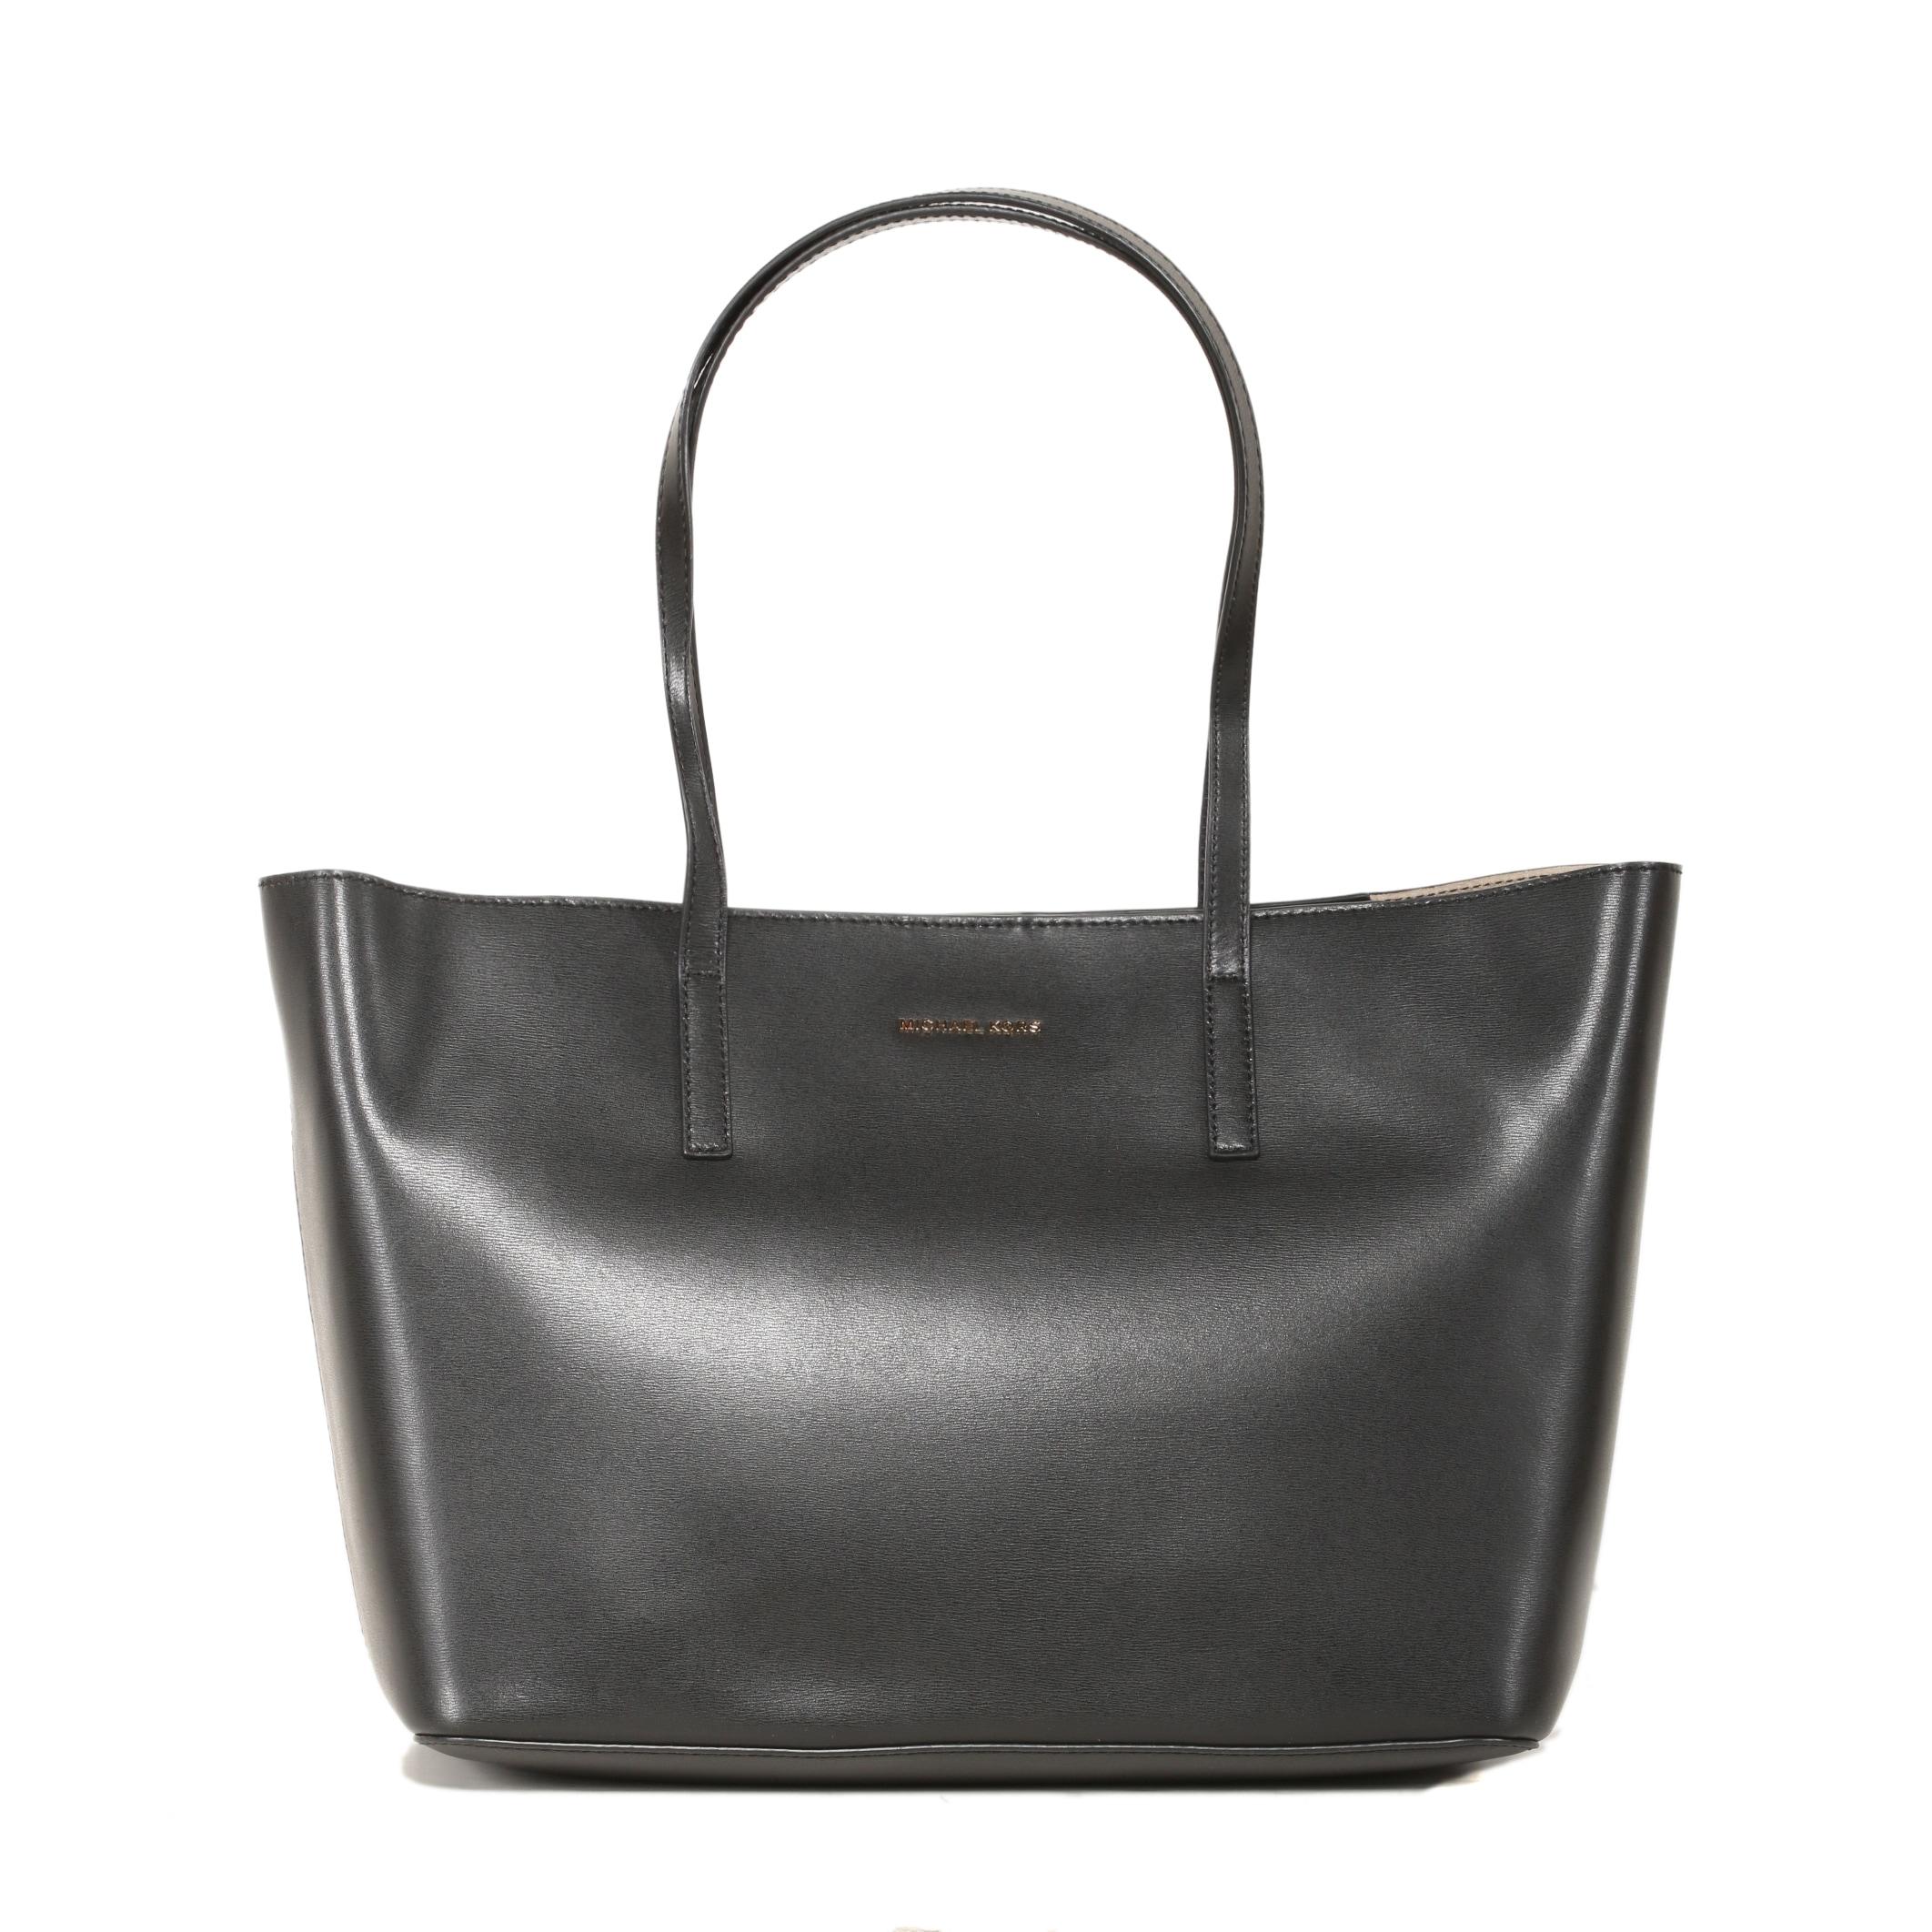 9015bbff255b99 Shop Michael Kors Emry Large Black Tote Bag - Free Shipping Today ...